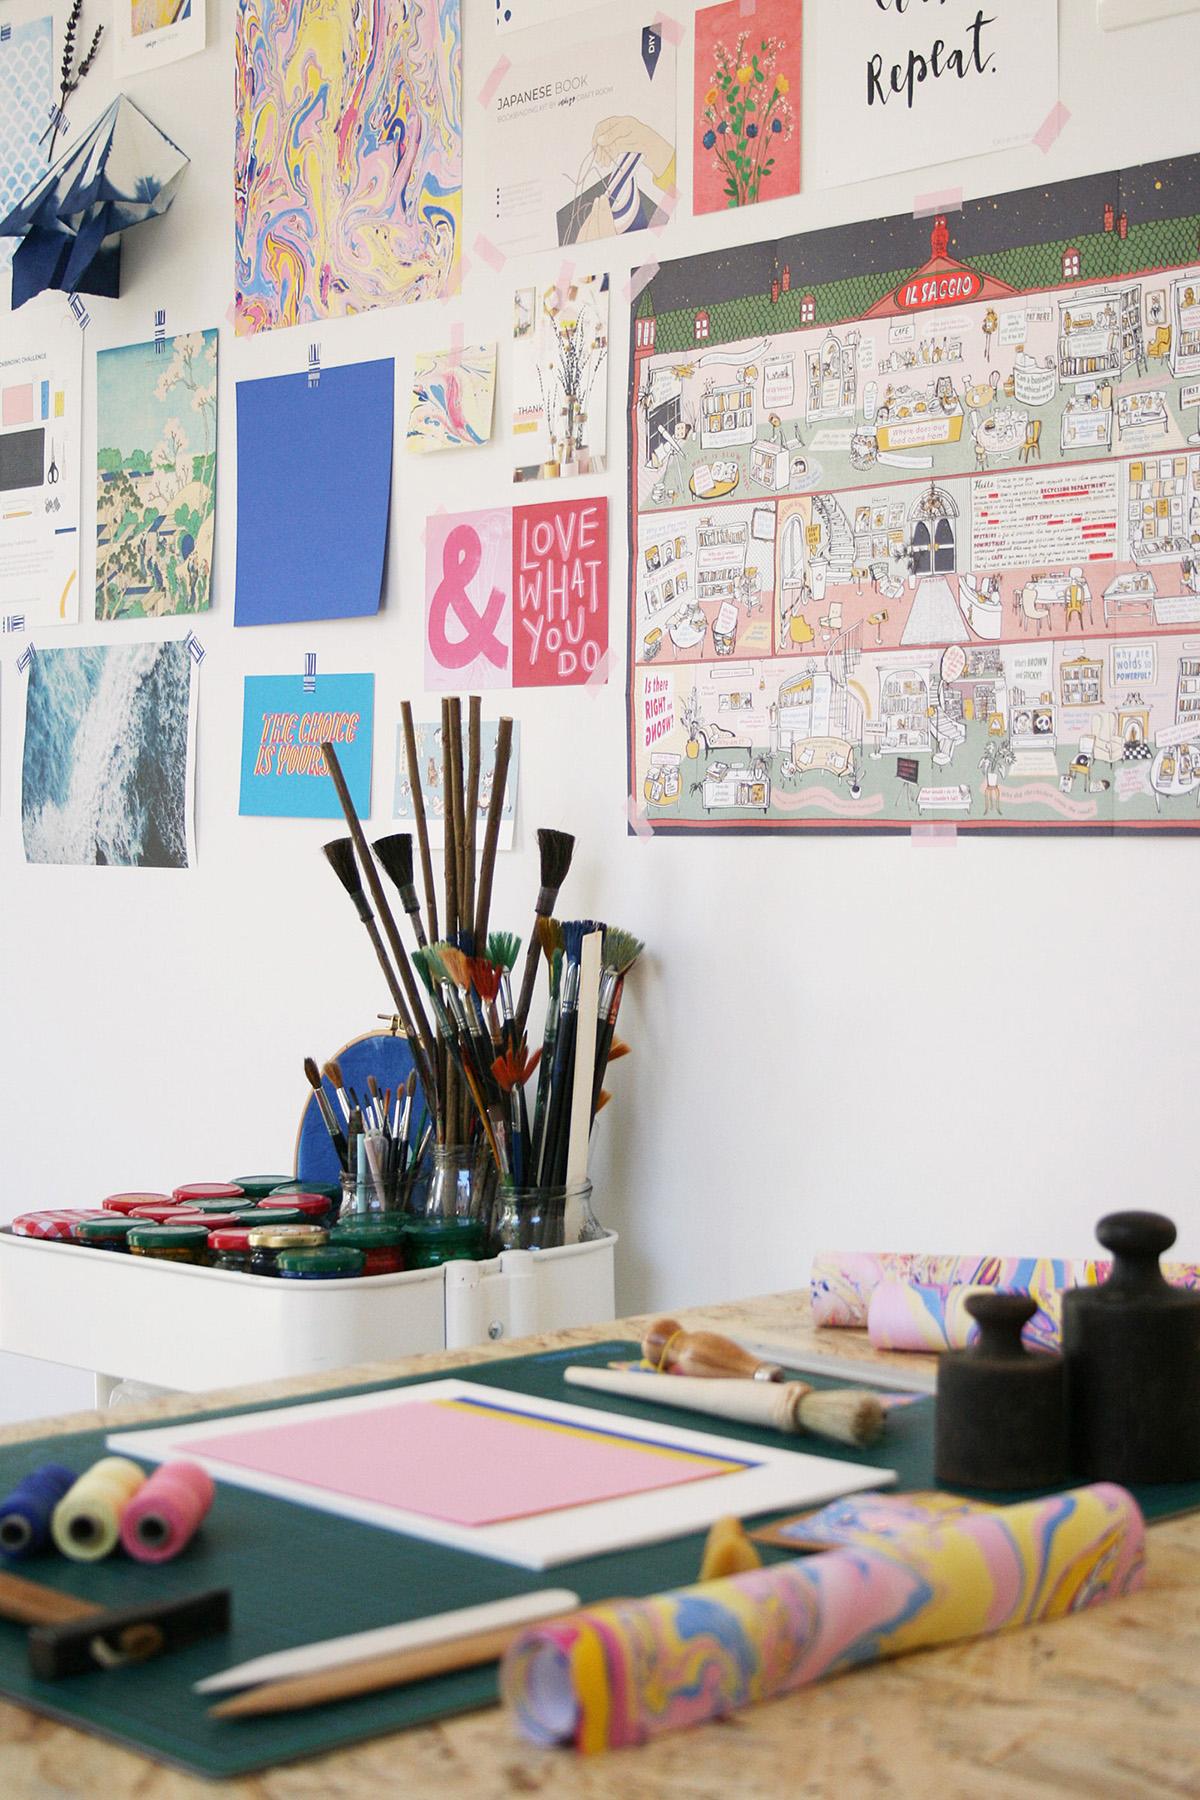 Bild 13_Indigo-Craft-Room-Paper-Studio-Munich